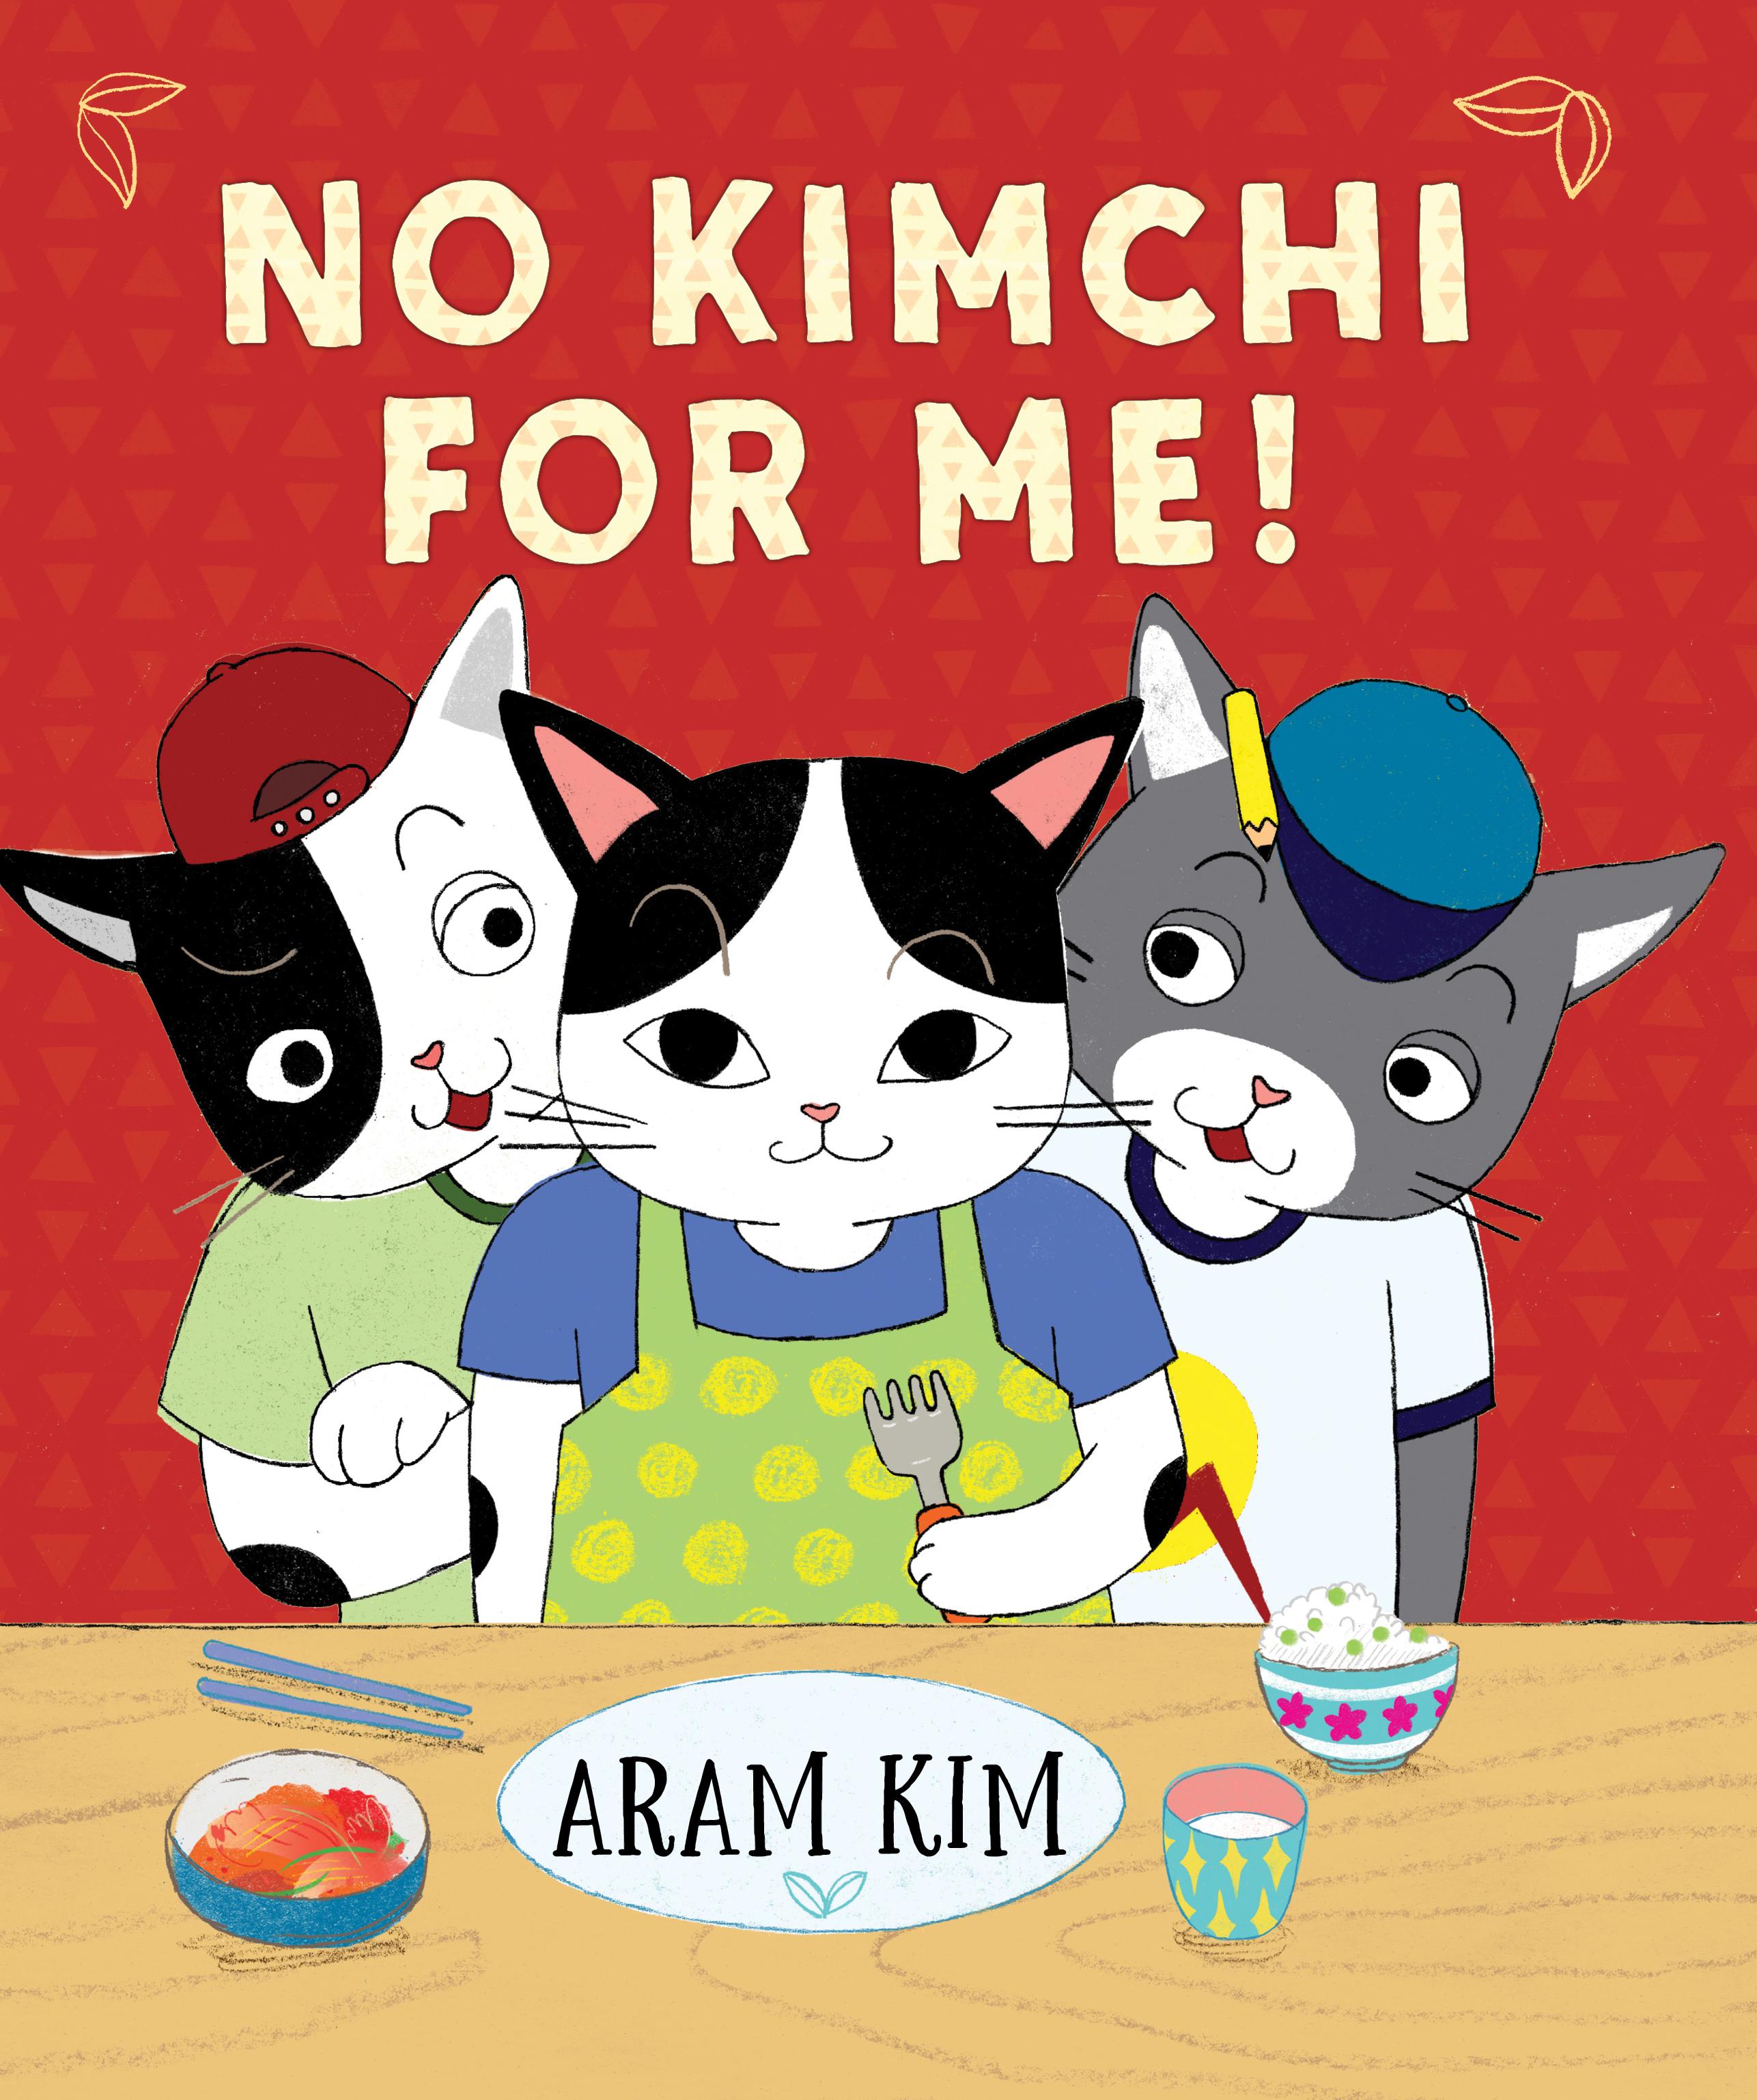 Sunday Story Time with Aram Kim (Author & Illustrator of No Kimchi for Me!)